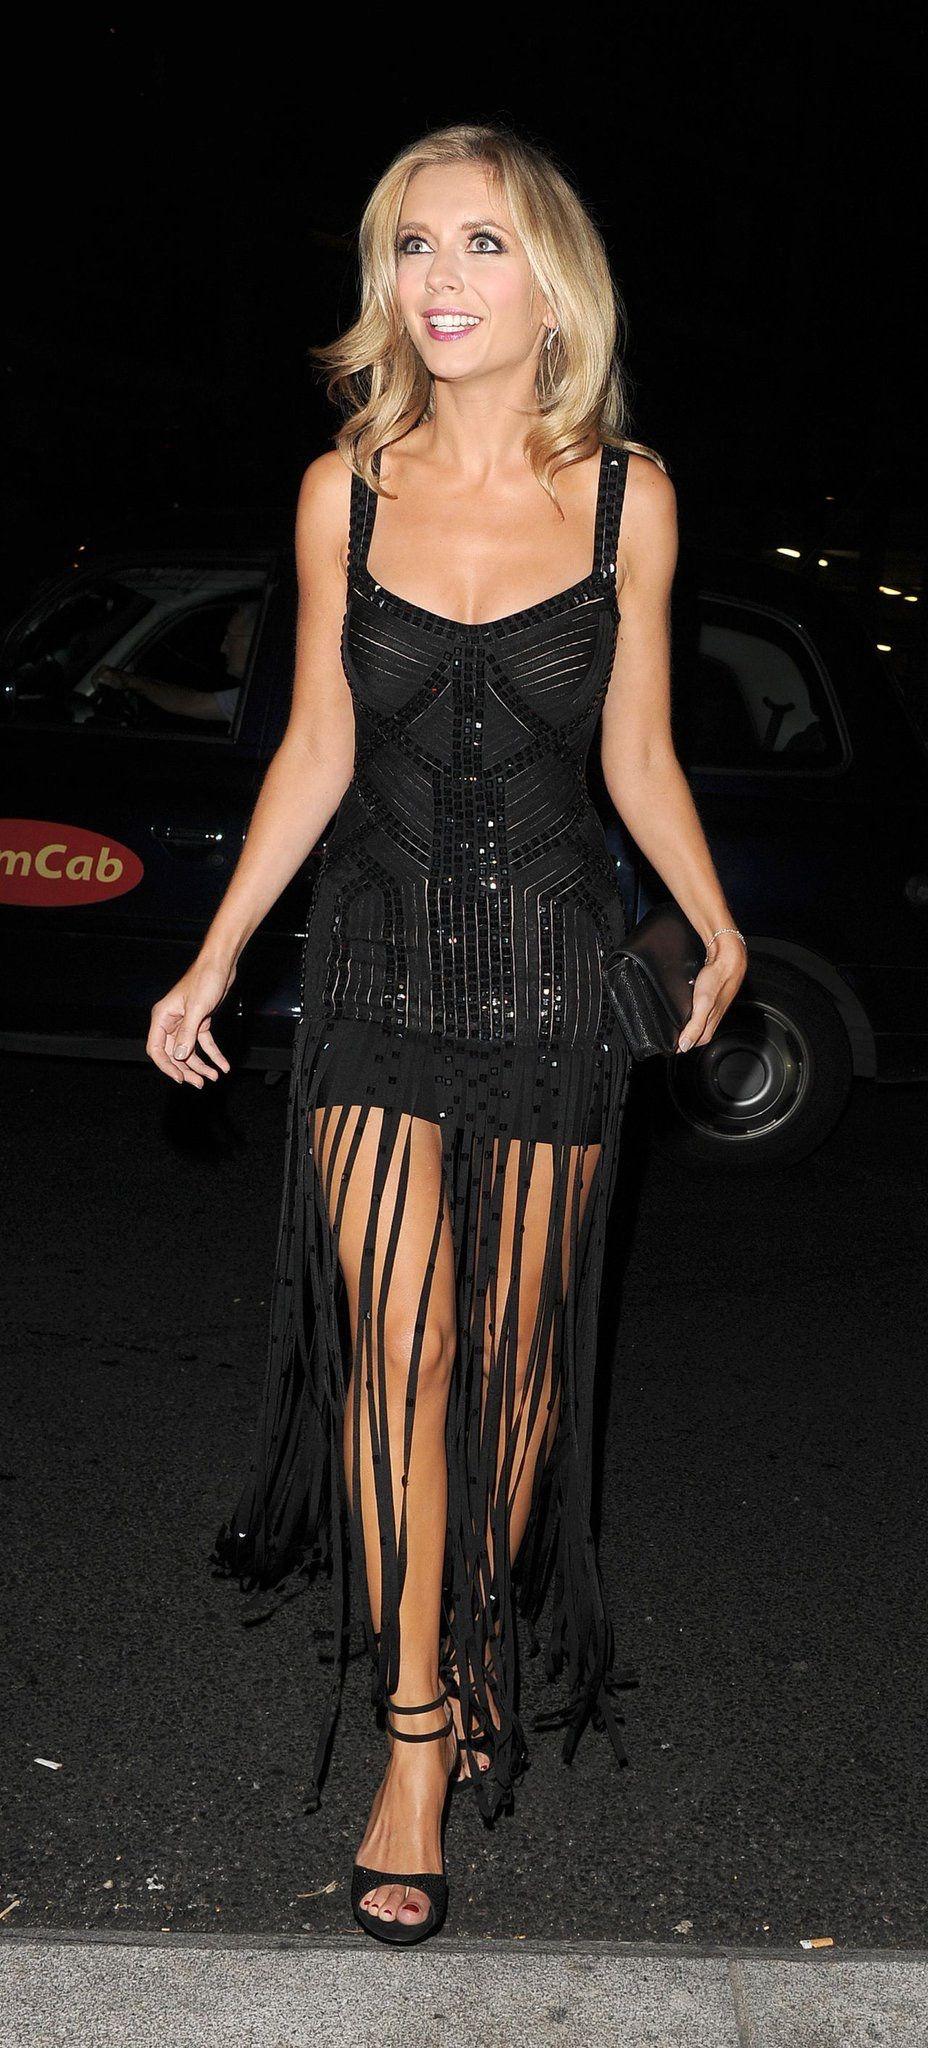 Celebrites Amanda Riley nude (72 photos), Ass, Sideboobs, Boobs, underwear 2006